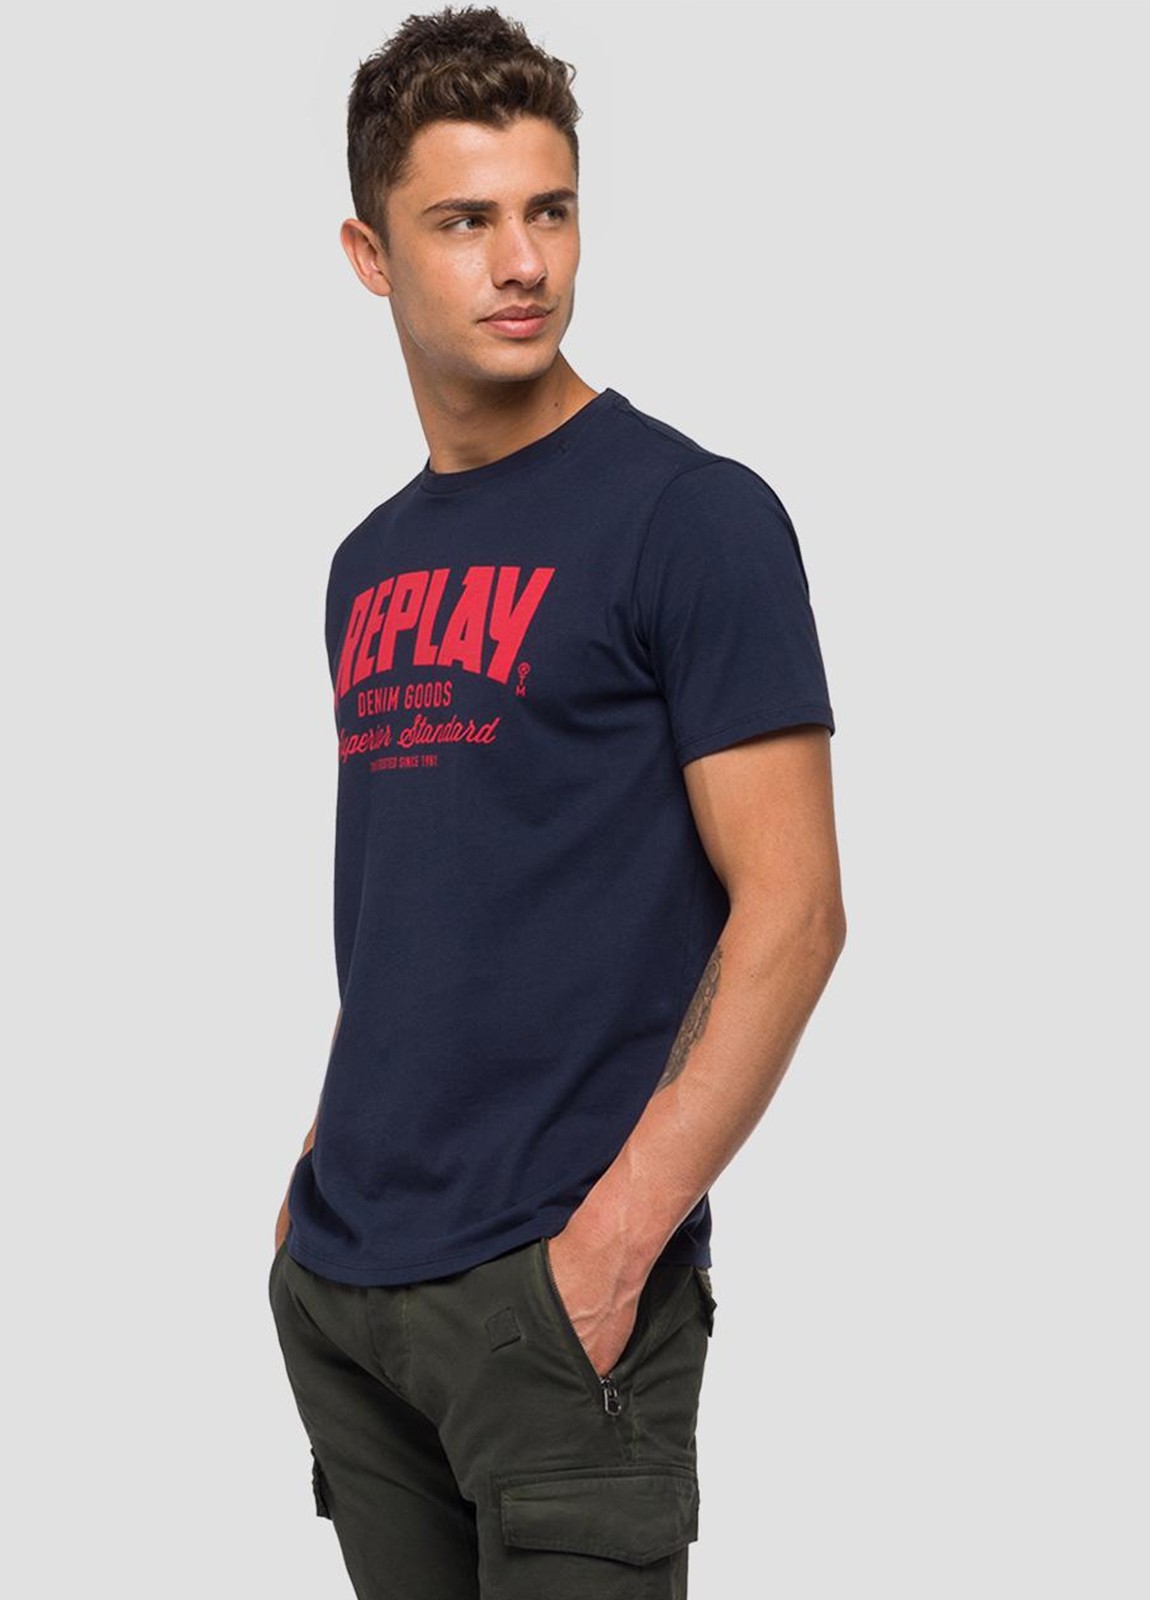 Camiseta manga corta color azul marino con estampado Replay denim. 100% Algodón. - Ítem1